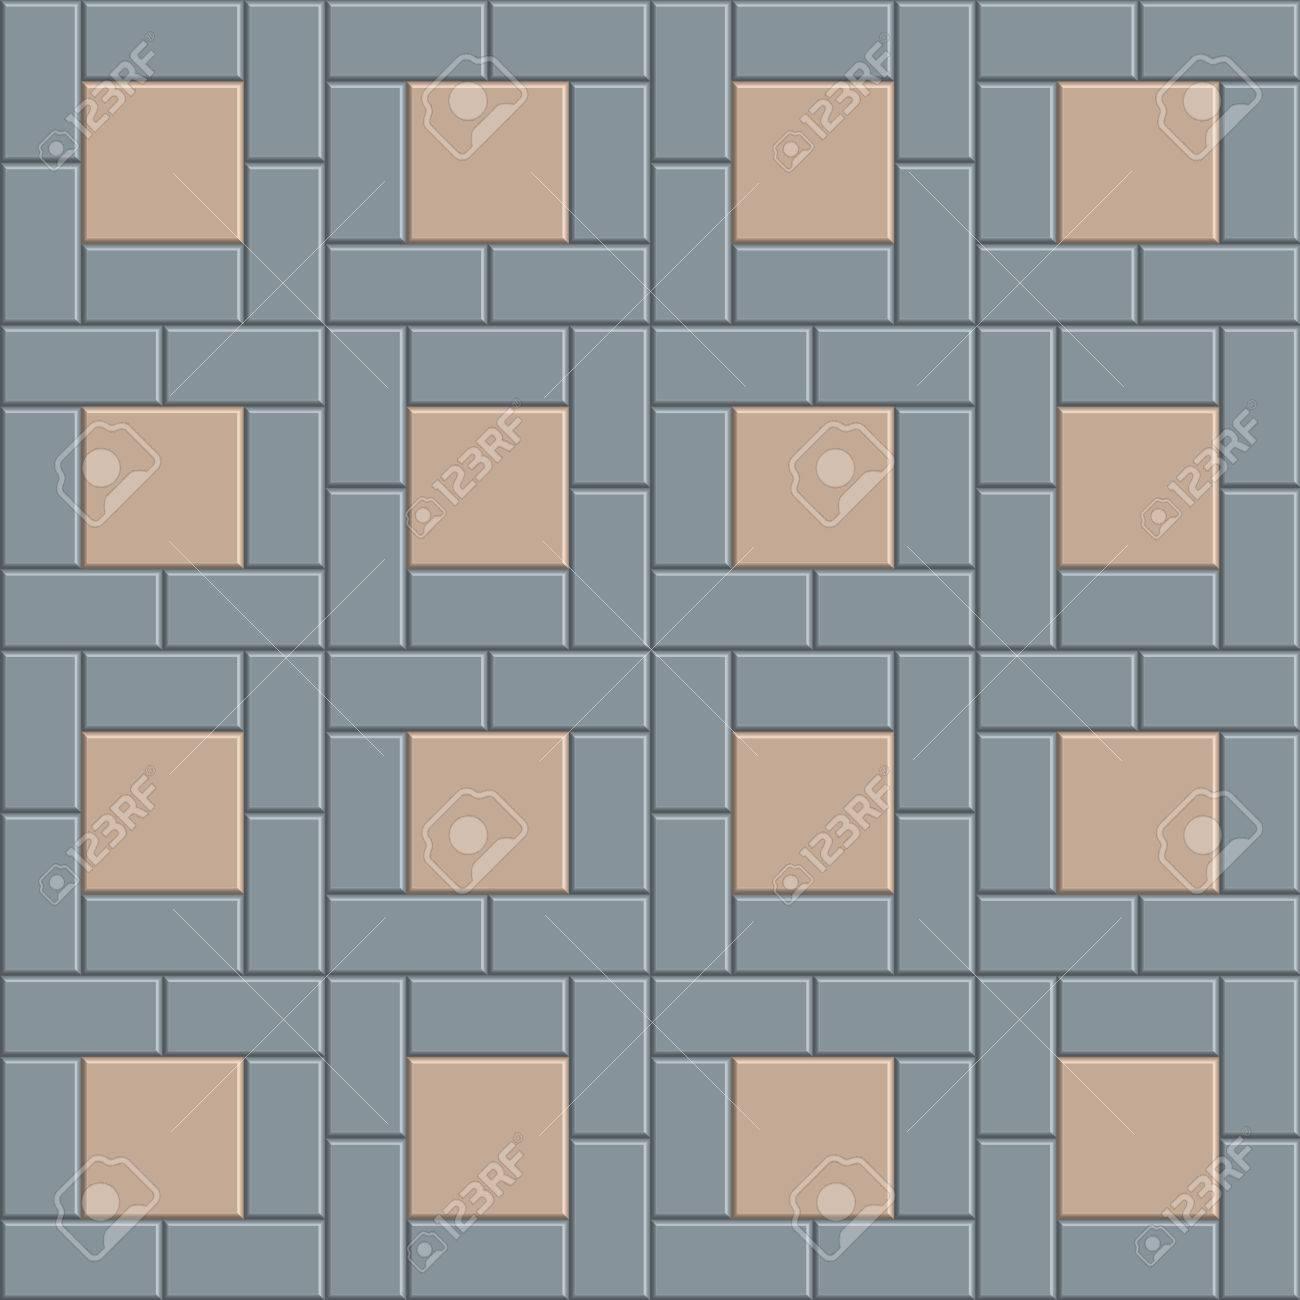 3D Brick Pavement Tile Floor Seamless Pattern For Decoration ...